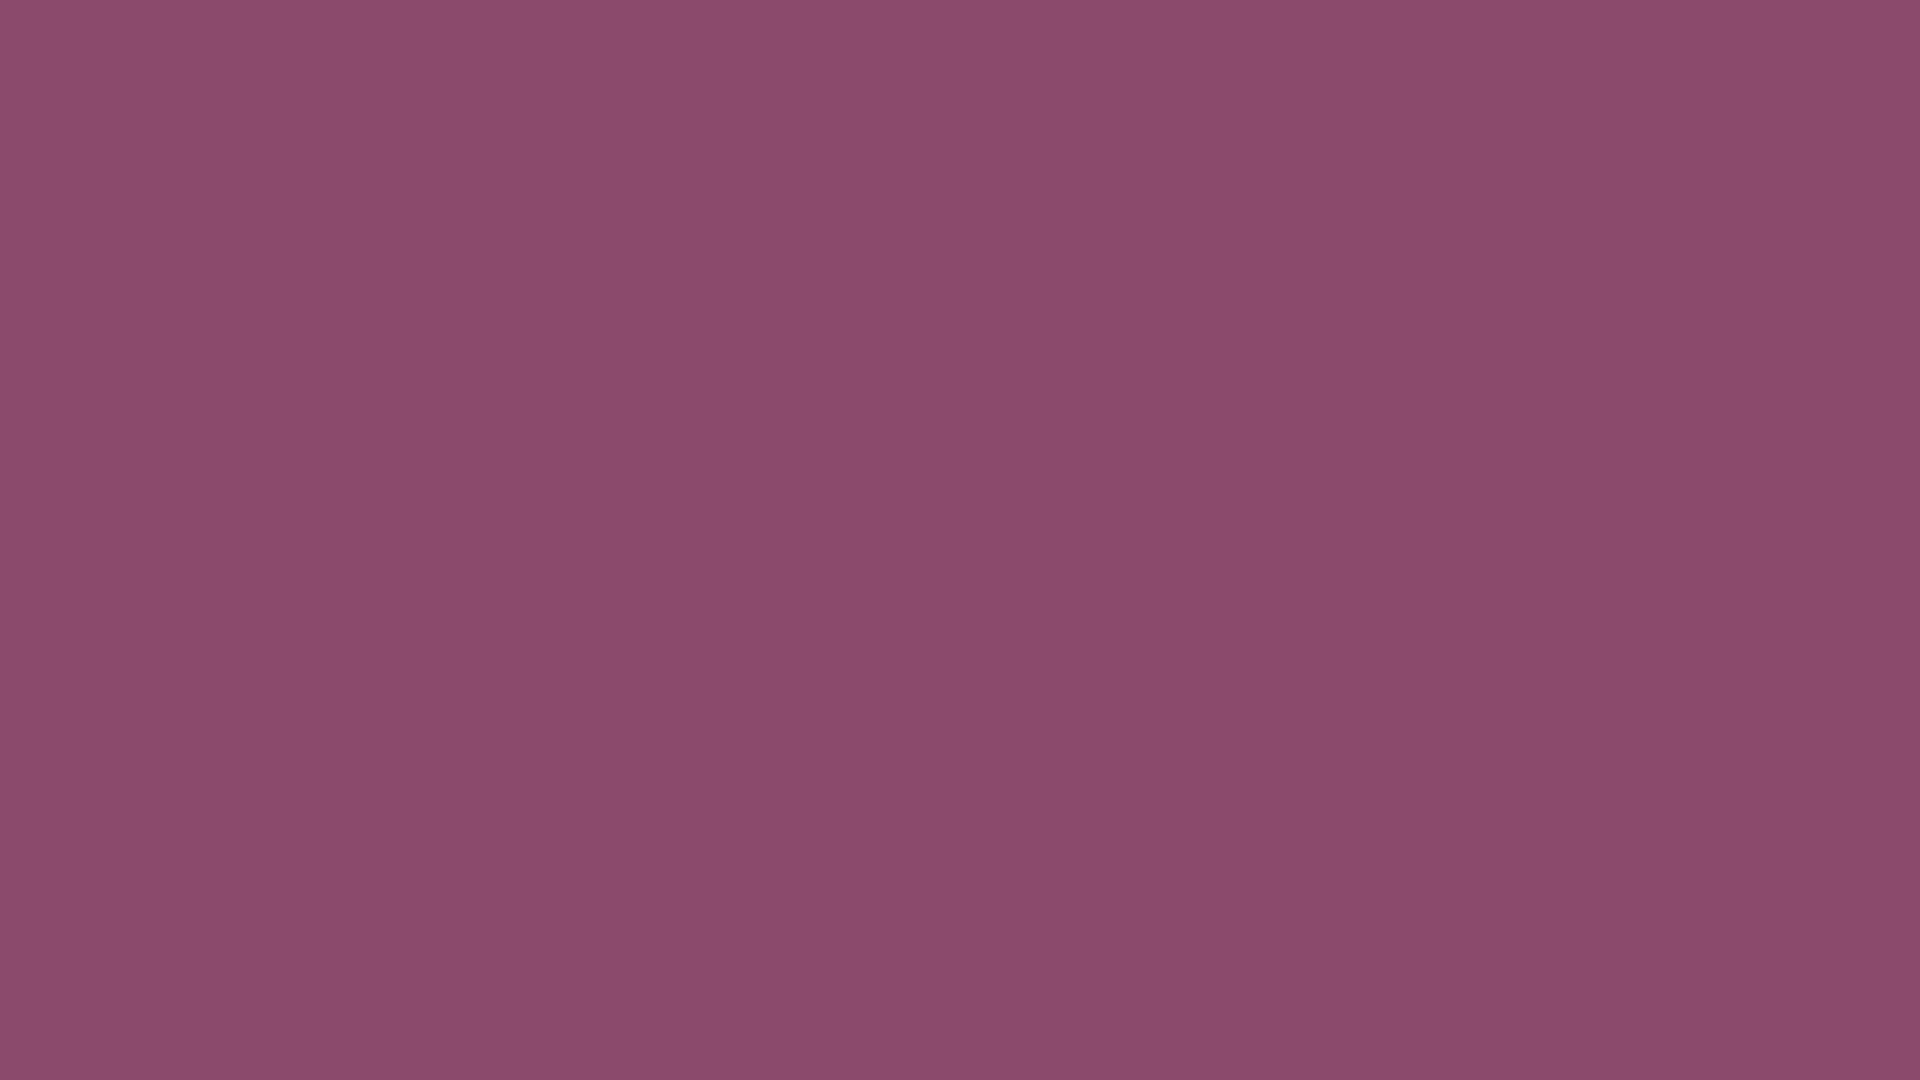 1920x1080 Twilight Lavender Solid Color Background